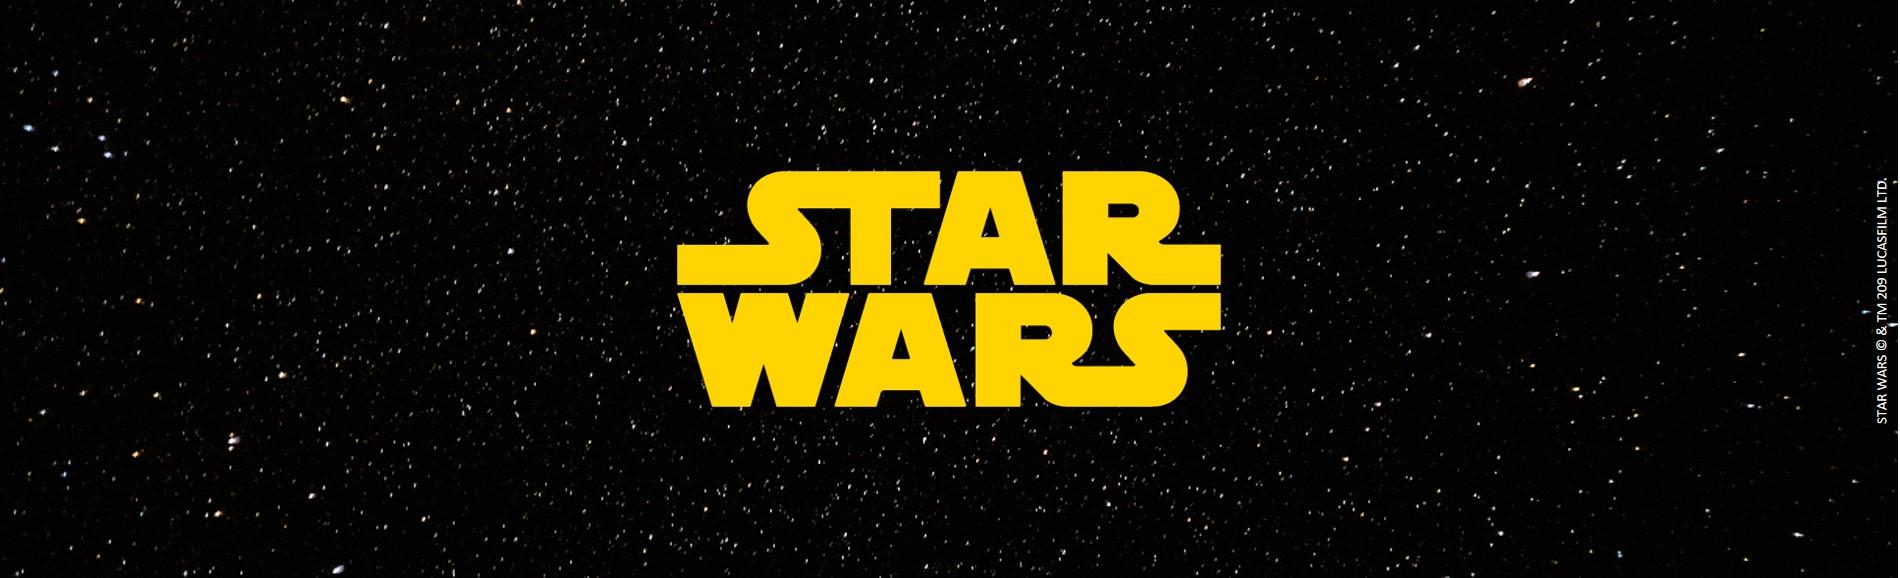 StarWars-TopBanner_DraftLiVPa4kCKfBP3